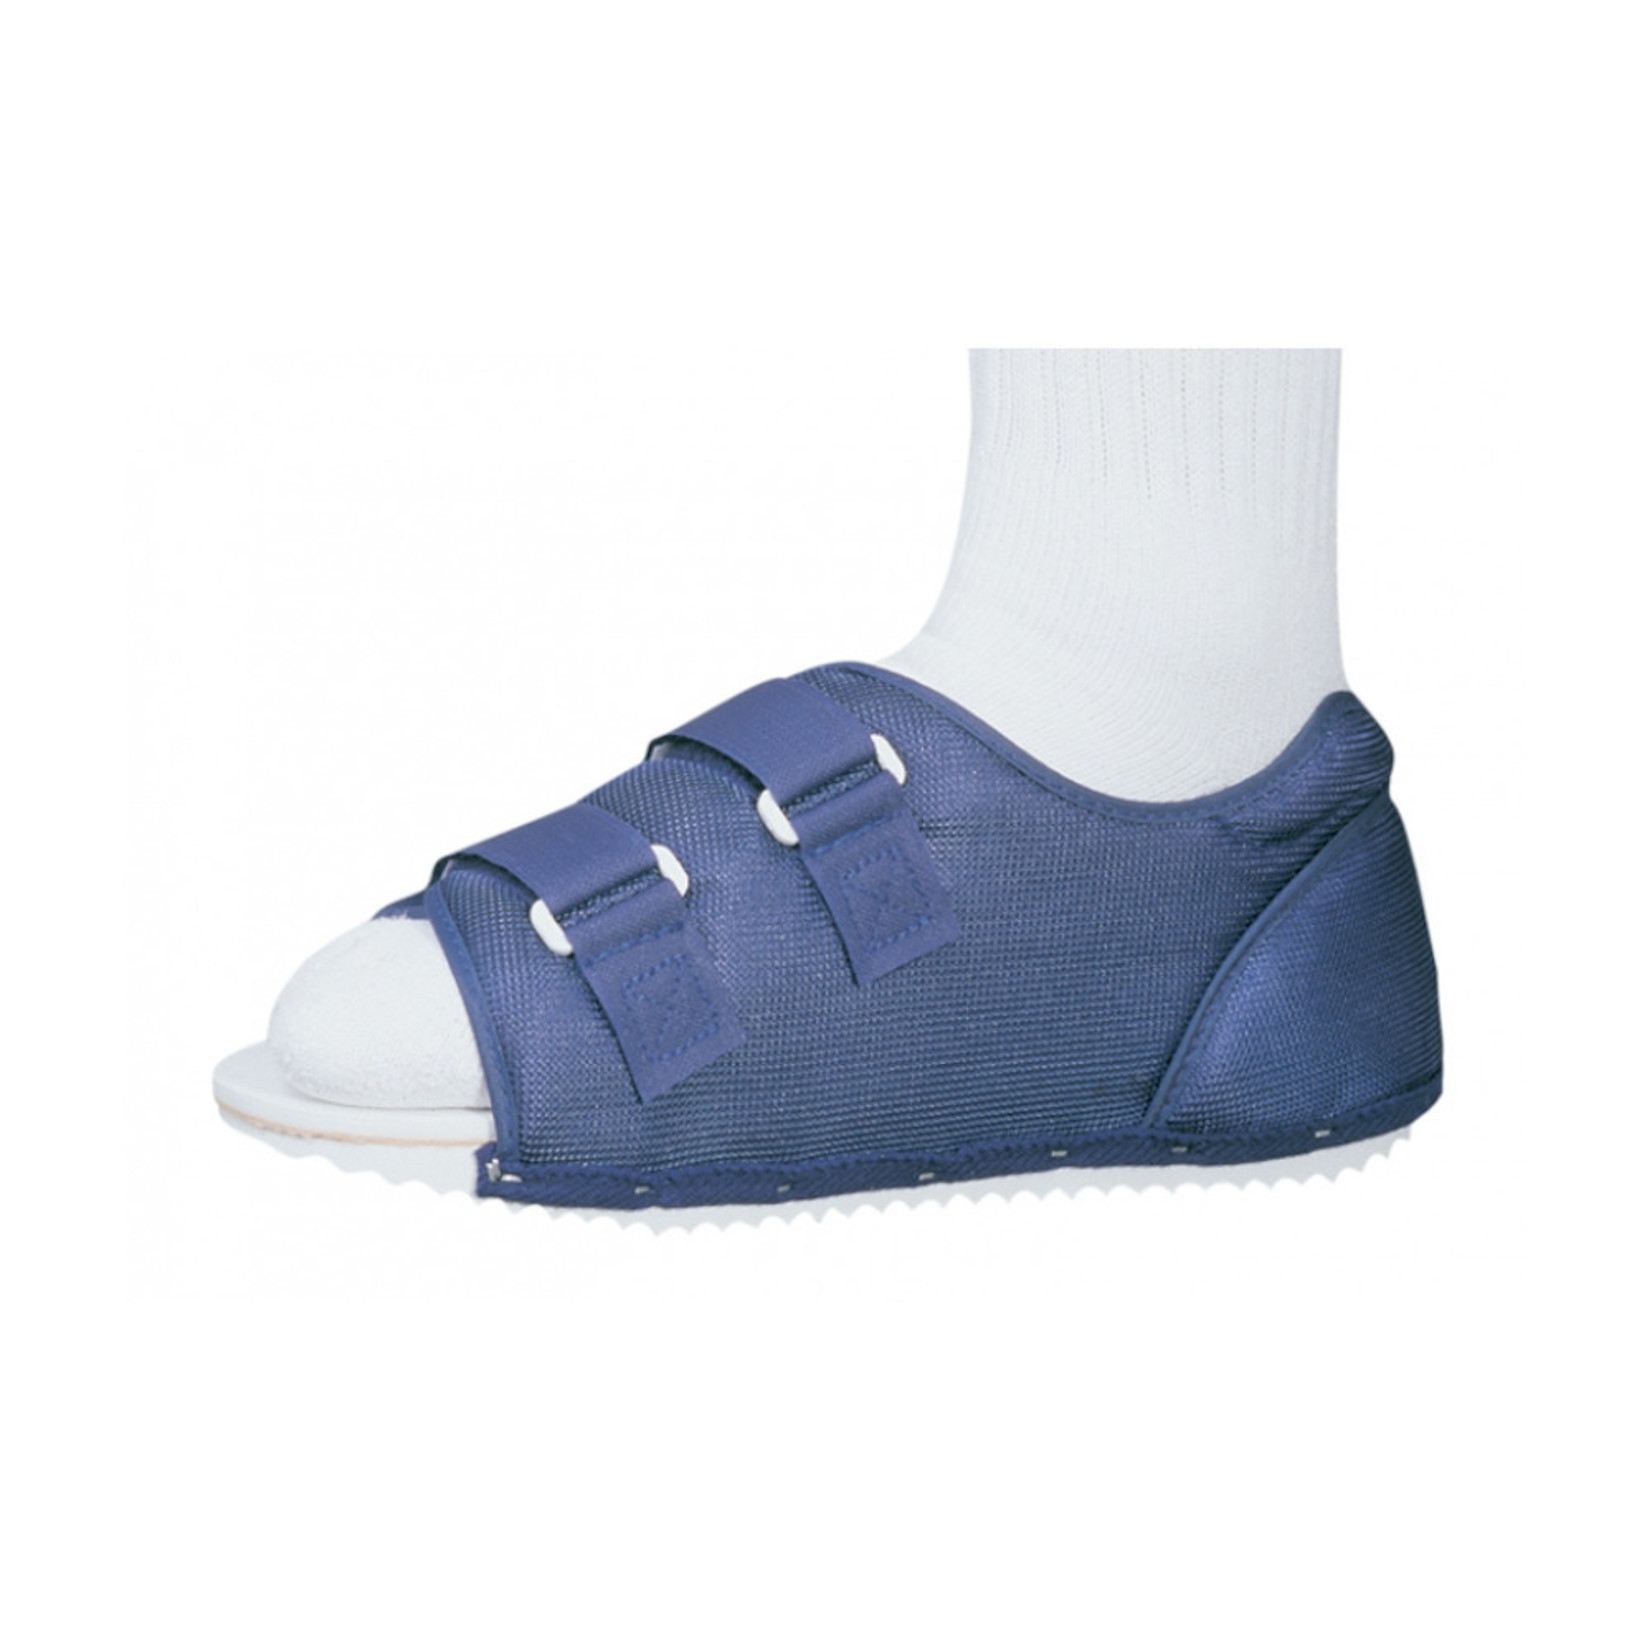 DON JOY / Aircast Post Op Shoe MEN - Medium